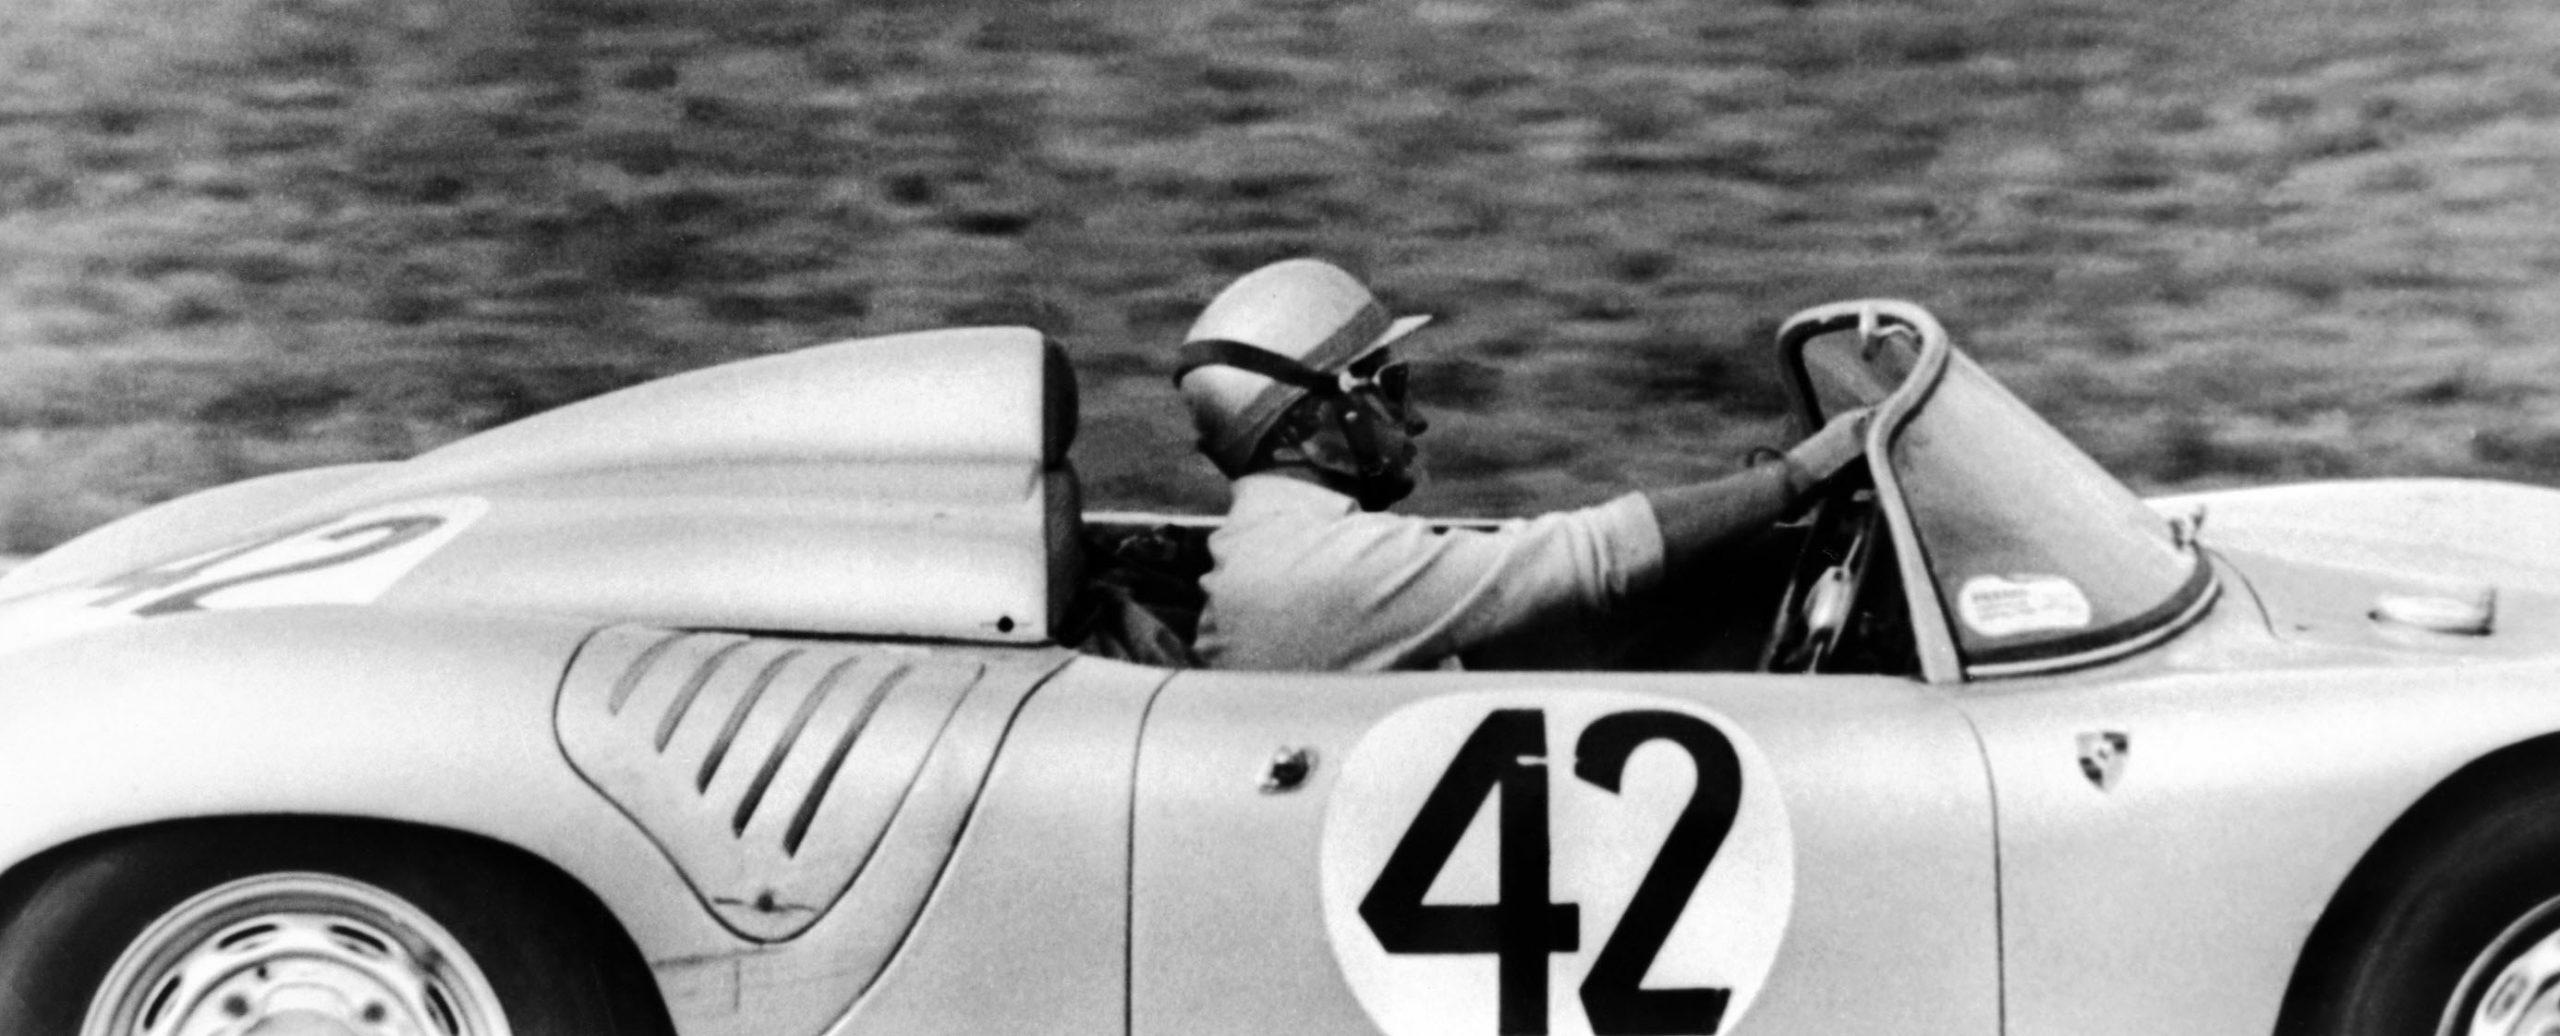 12 hours sebring 1960 porsche first vin with hans herrmann racing 718 rs 60 spyder